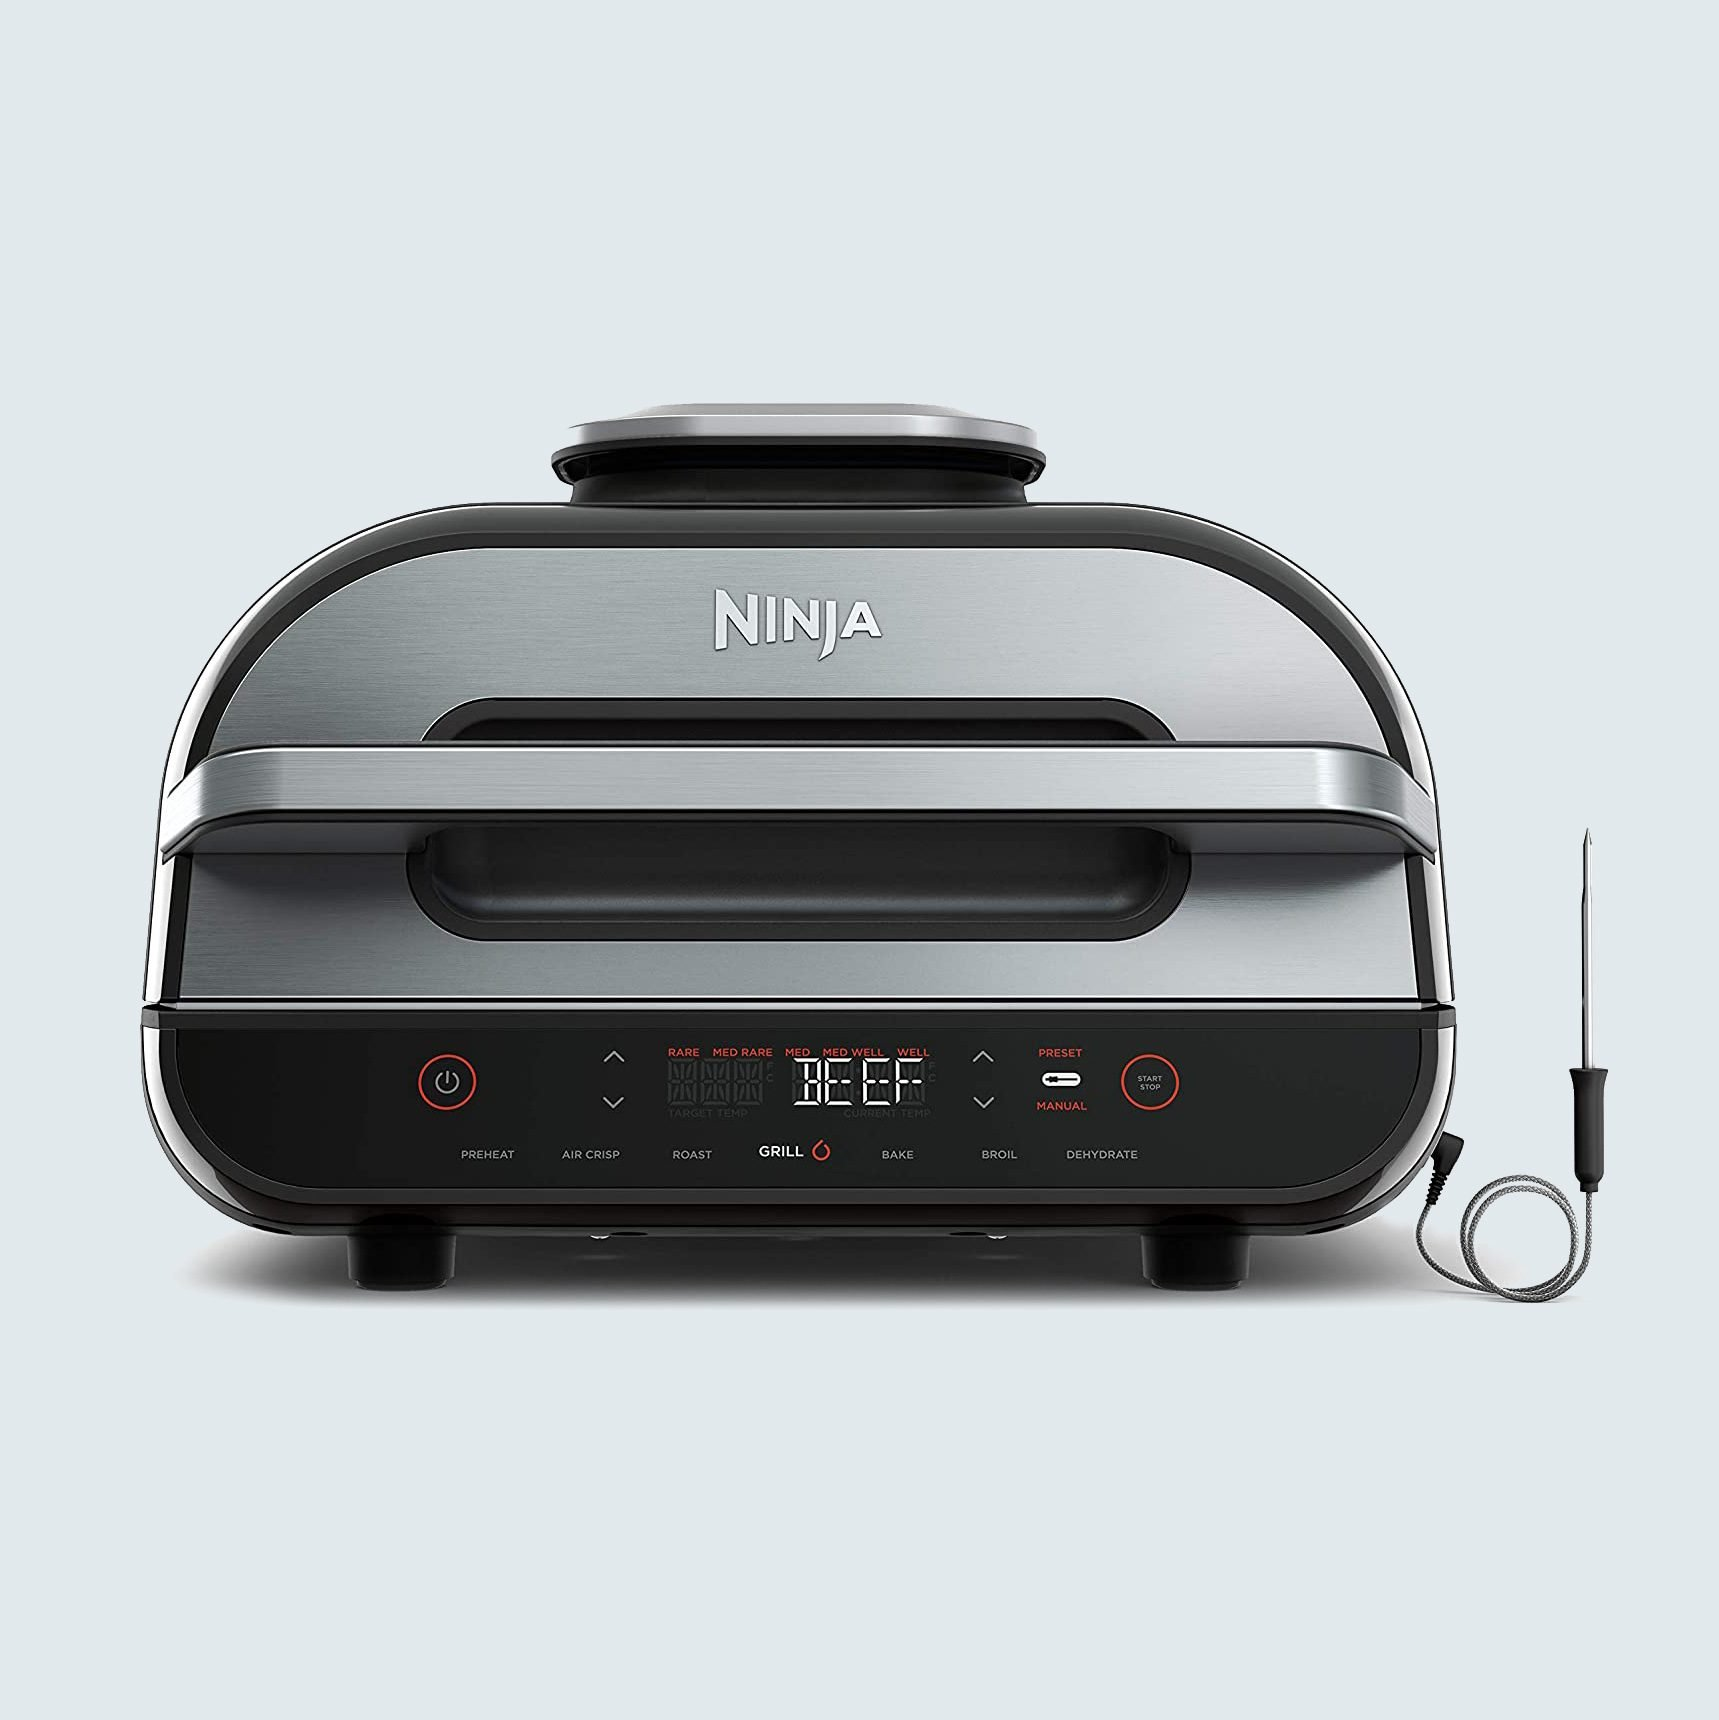 Ninja FG551 Foodi Smart XL 6-in-1 Indoor Grill